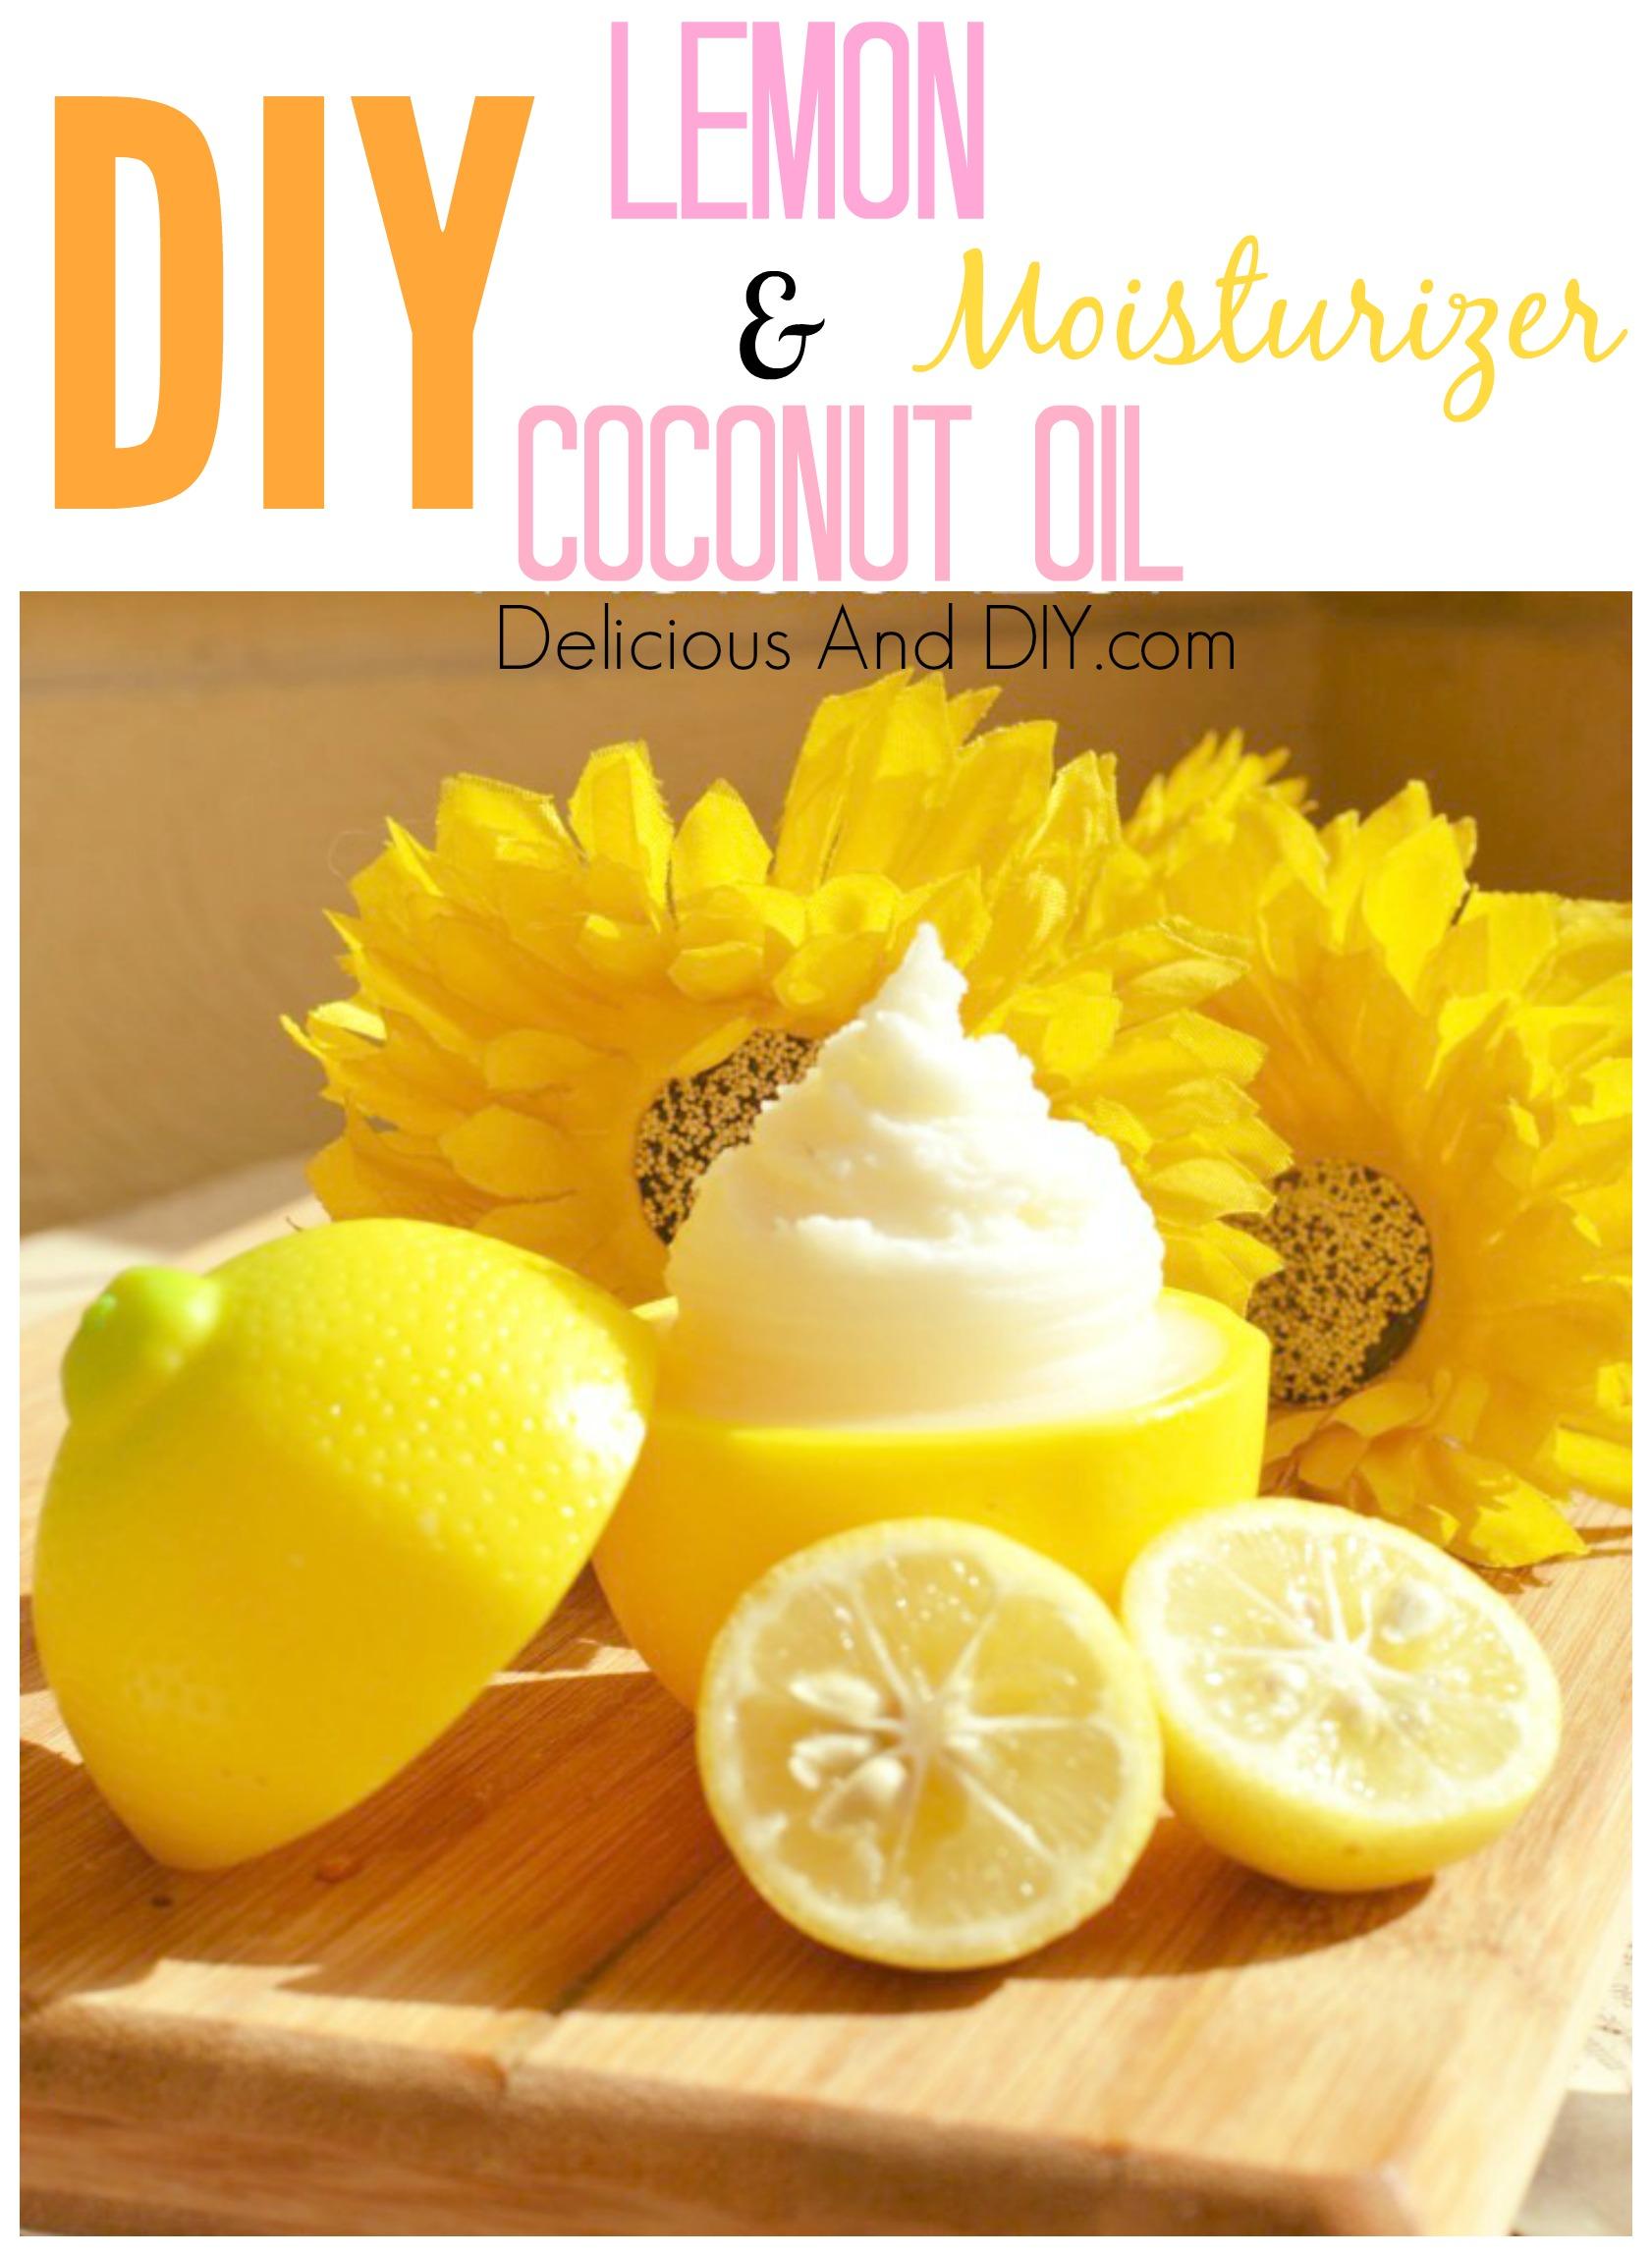 Lemon and organic coconut oil face moisturizer delicious and diy lemon coconut oil moisturizer organic coconut oil lotion diy home made lotion diy solutioingenieria Gallery